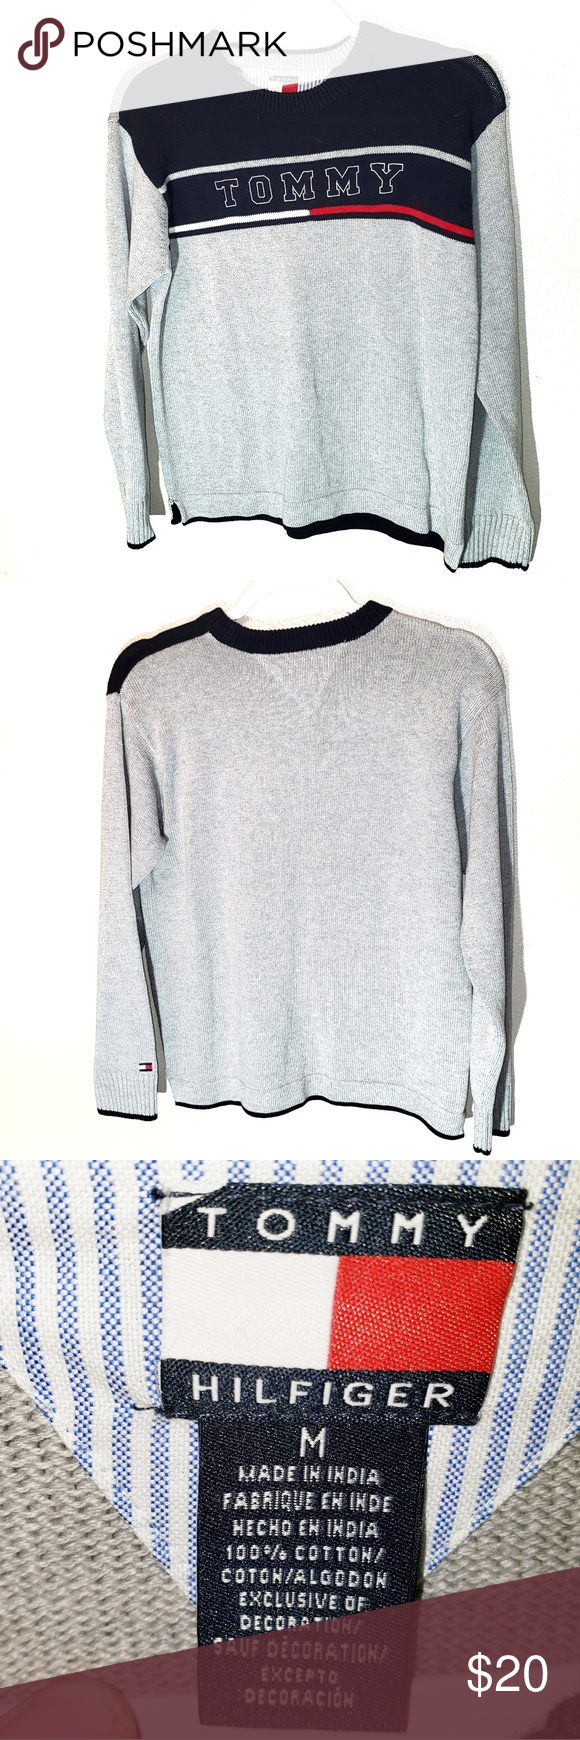 Tommy Hilfiger Tommy Logo Crewneck Sweater Tommy Hilfiger Tommy Logo Crewneck Sweater Size Medium C21 Tommy Tommy Hilfiger Crew Neck Sweater Fashion [ 1740 x 580 Pixel ]